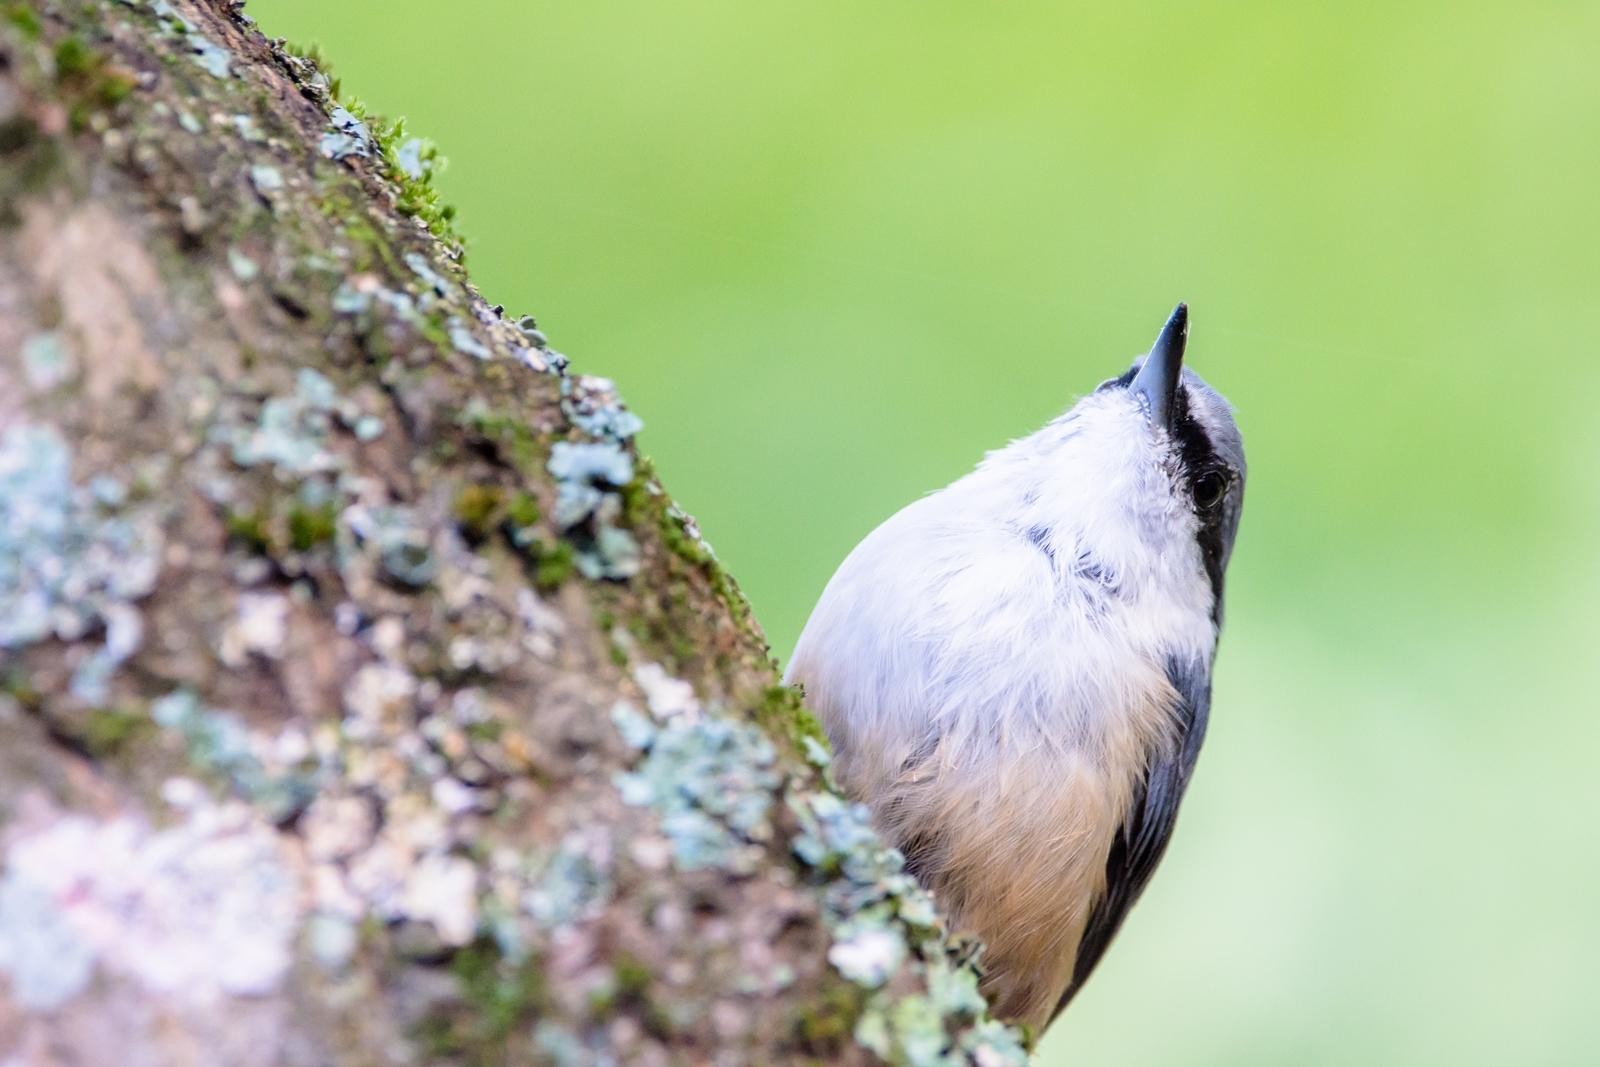 Photo: のんびり屋 An easygoing.  木の幹を 登ったり下ったり ぼ~っとしたり まわりも気にせず のんびりゆっくり  Eurasian nuthatch. (ゴジュウカラ)  #birdphotography #birds #cooljapan #kawaii #nikon #sigma  Nikon D7200 SIGMA 150-600mm F5-6.3 DG OS HSM Contemporary